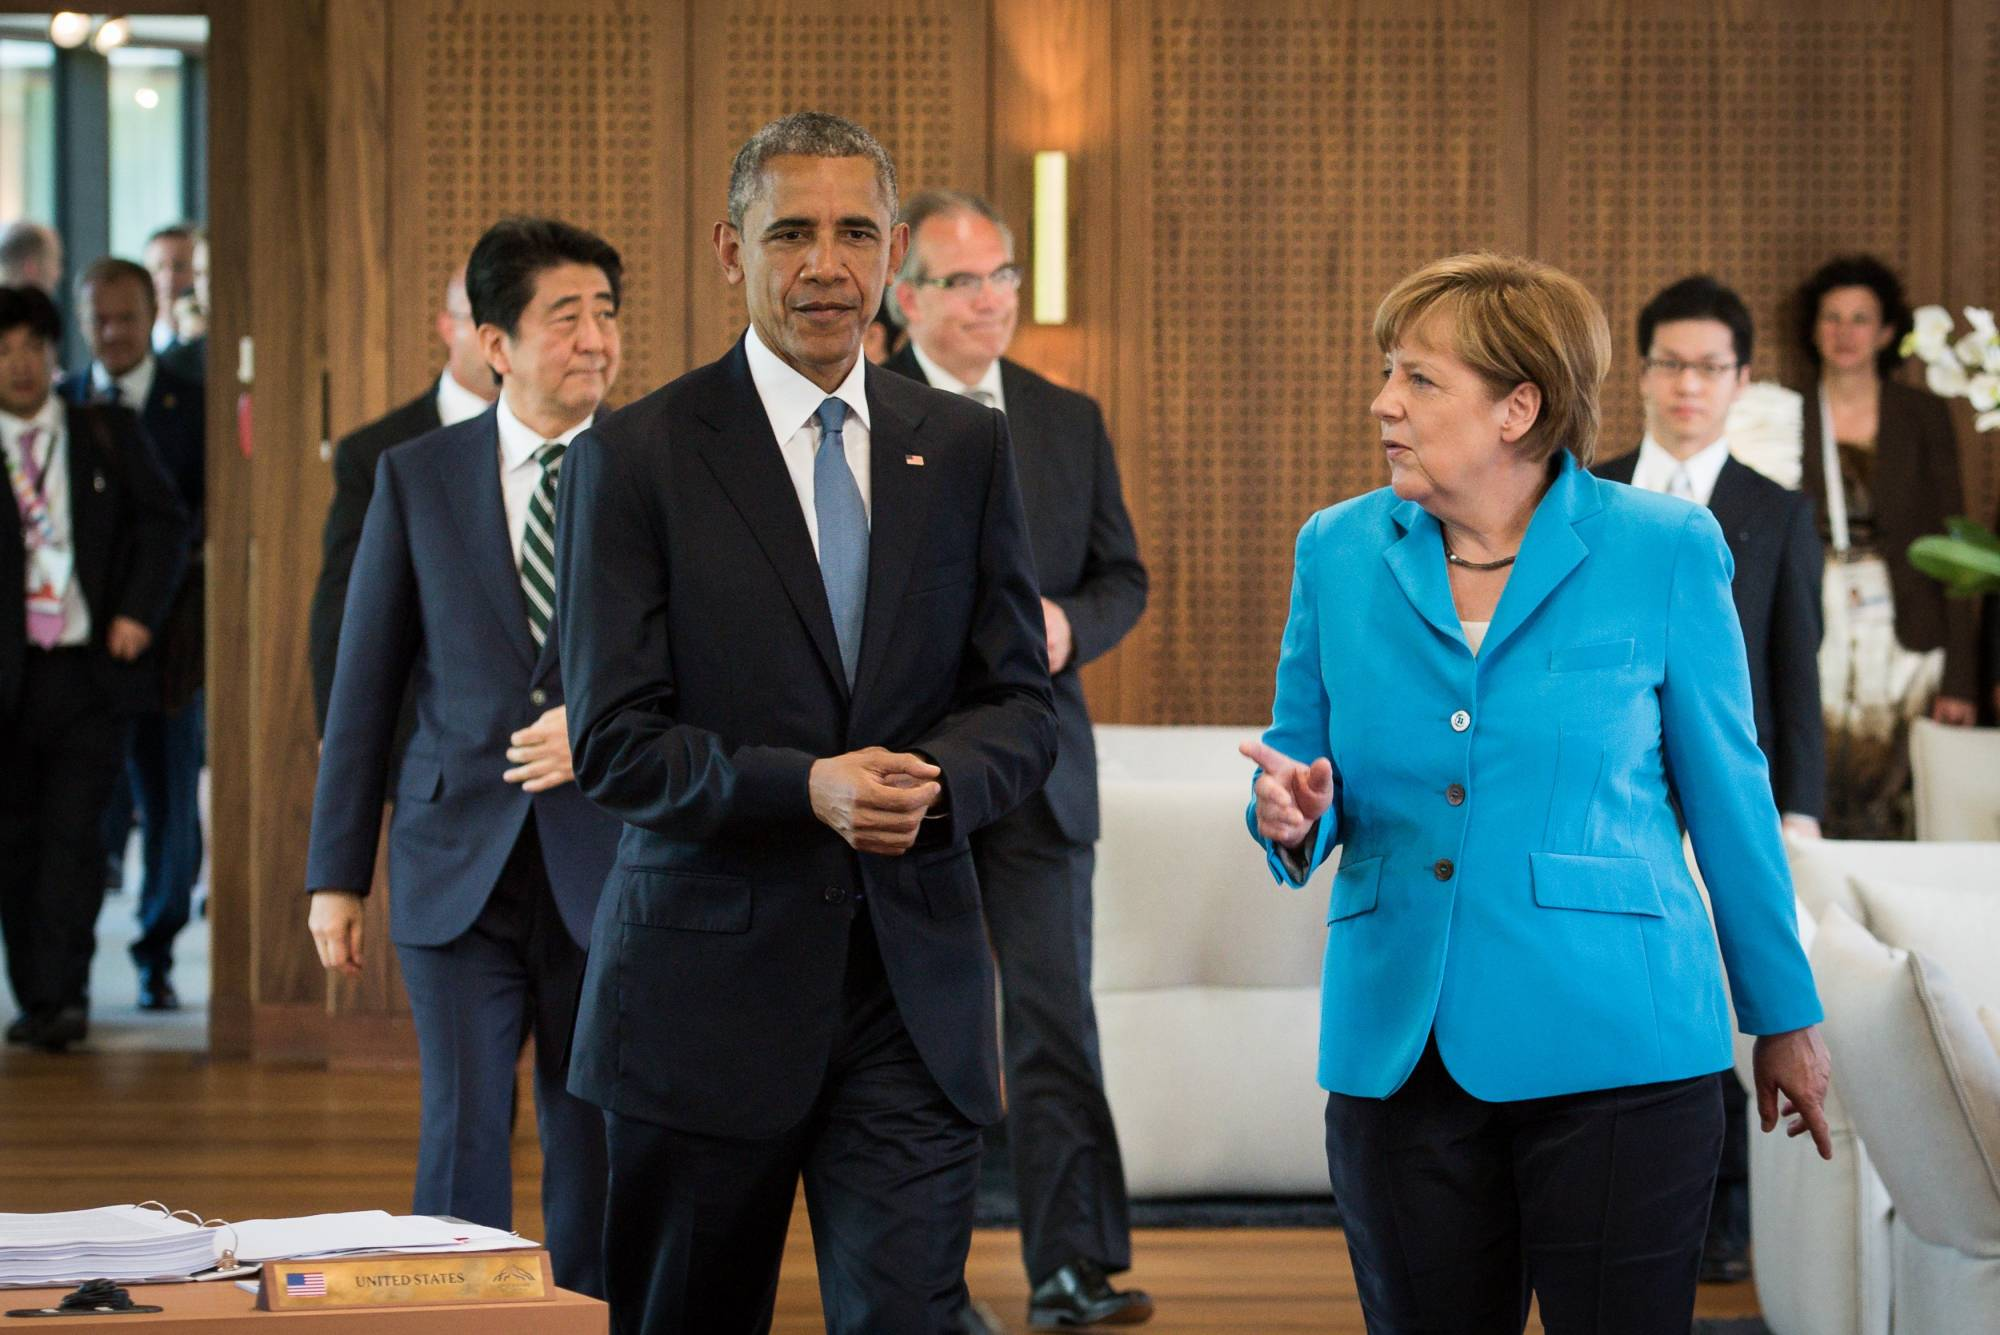 President Barack Obama and German Chancellor Angela Merkel in Munich - Bundesregierung/Kugler